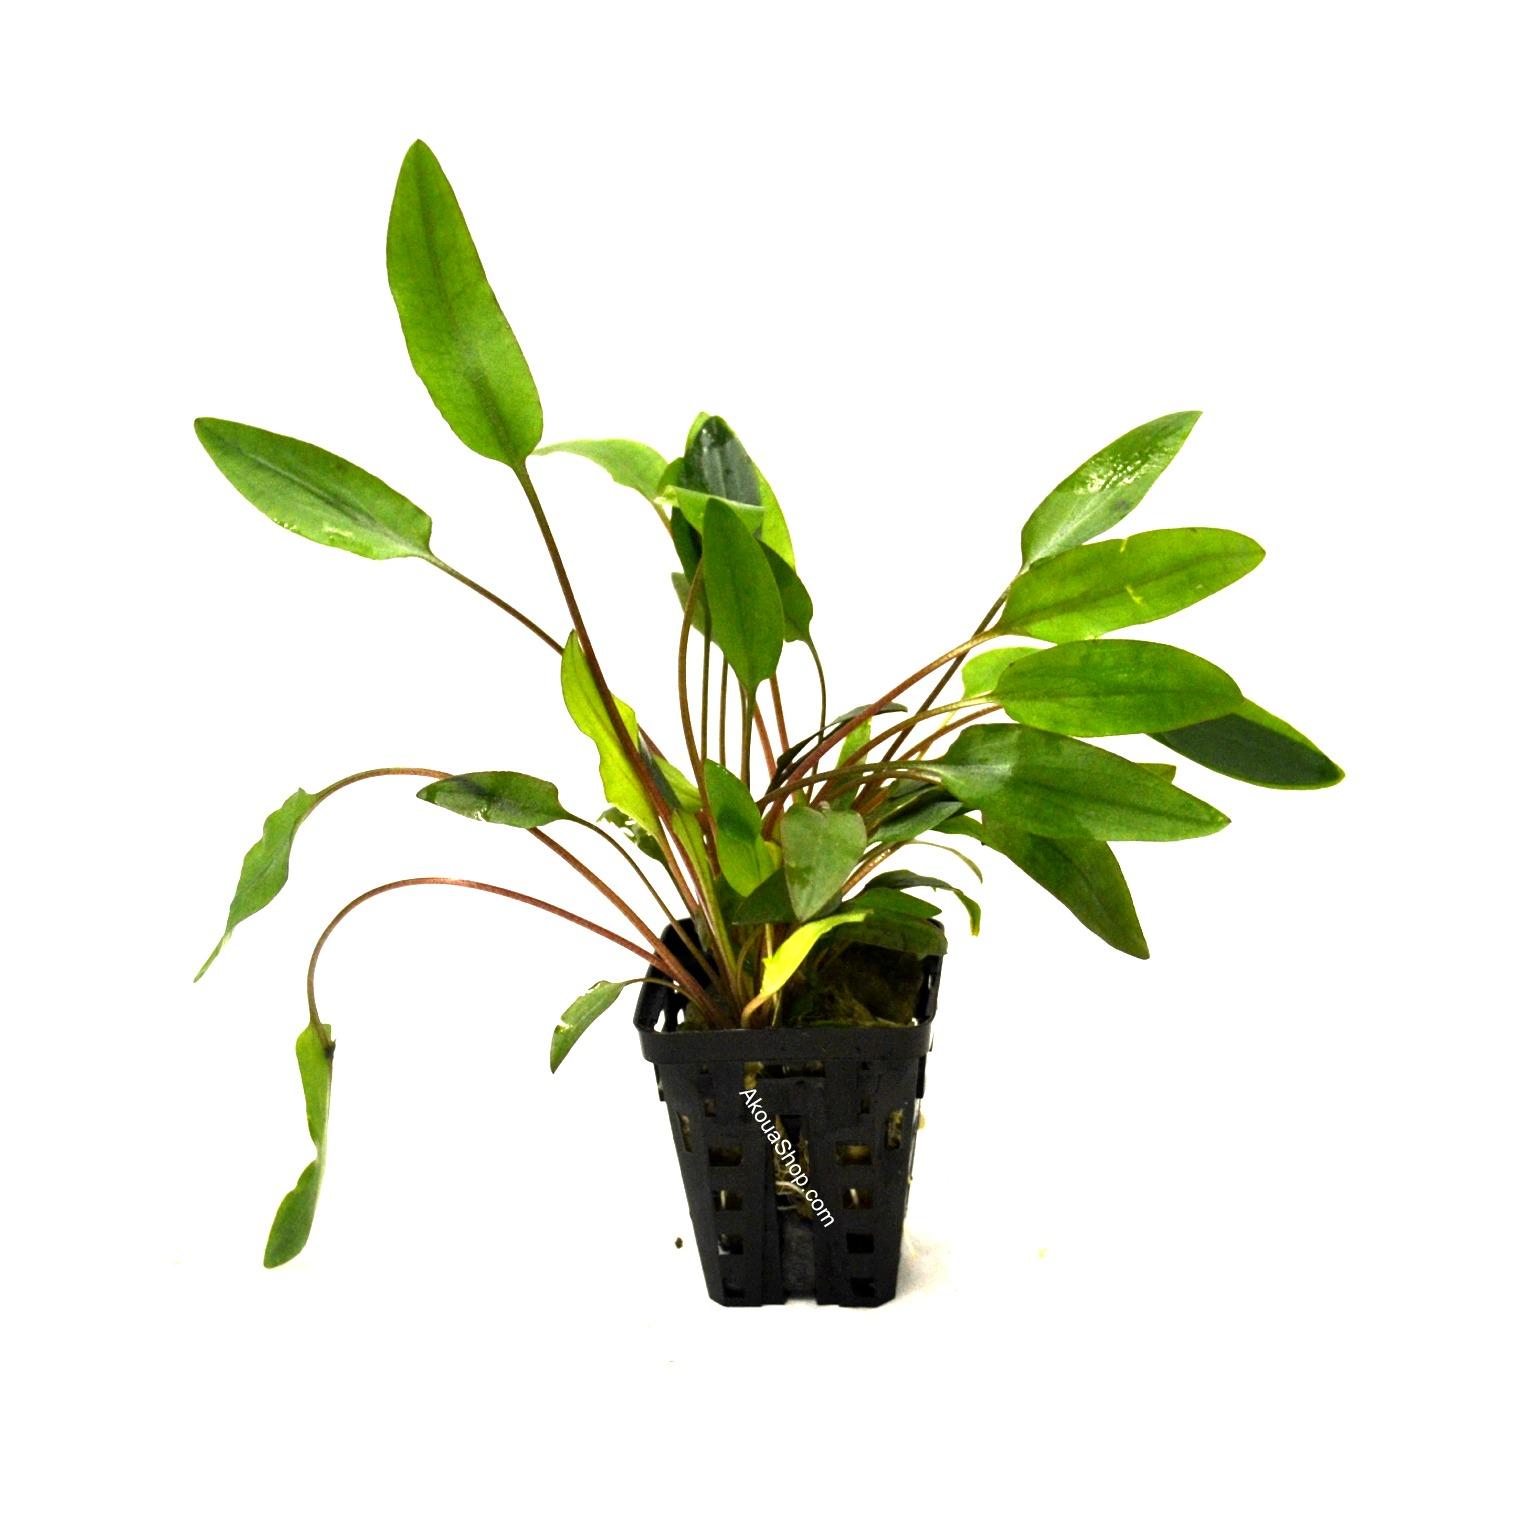 Cryptocoryne beckettii plante d 39 aquarium en pot de for Commande de plantes en ligne